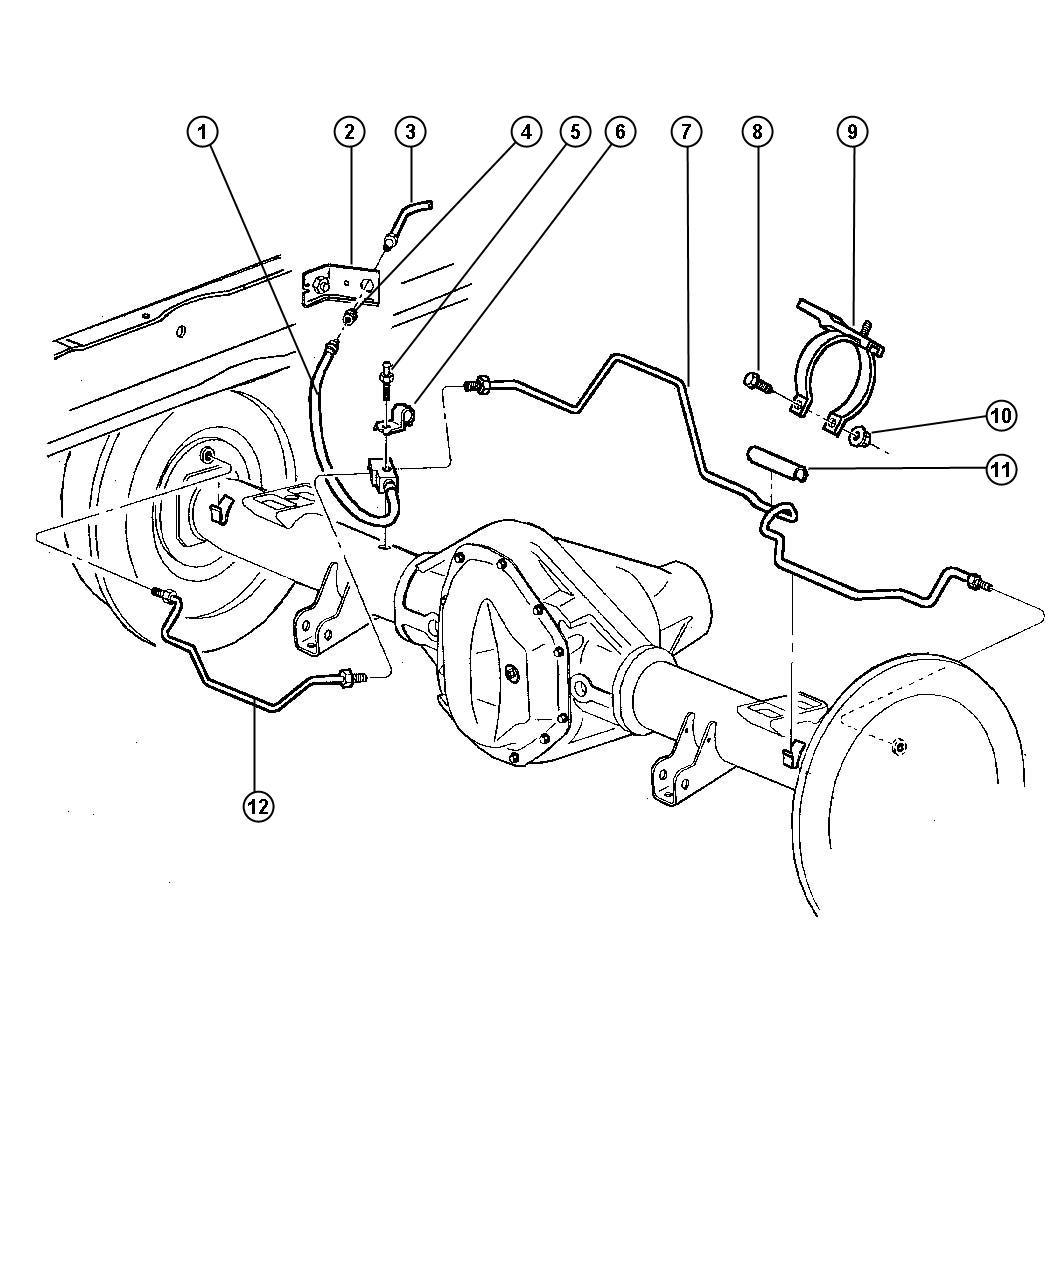 Dodge dakota brake lines best brake 2017 rh brake storesay site brake line plumbing diagram 1999 dodge durango brake line diagram location